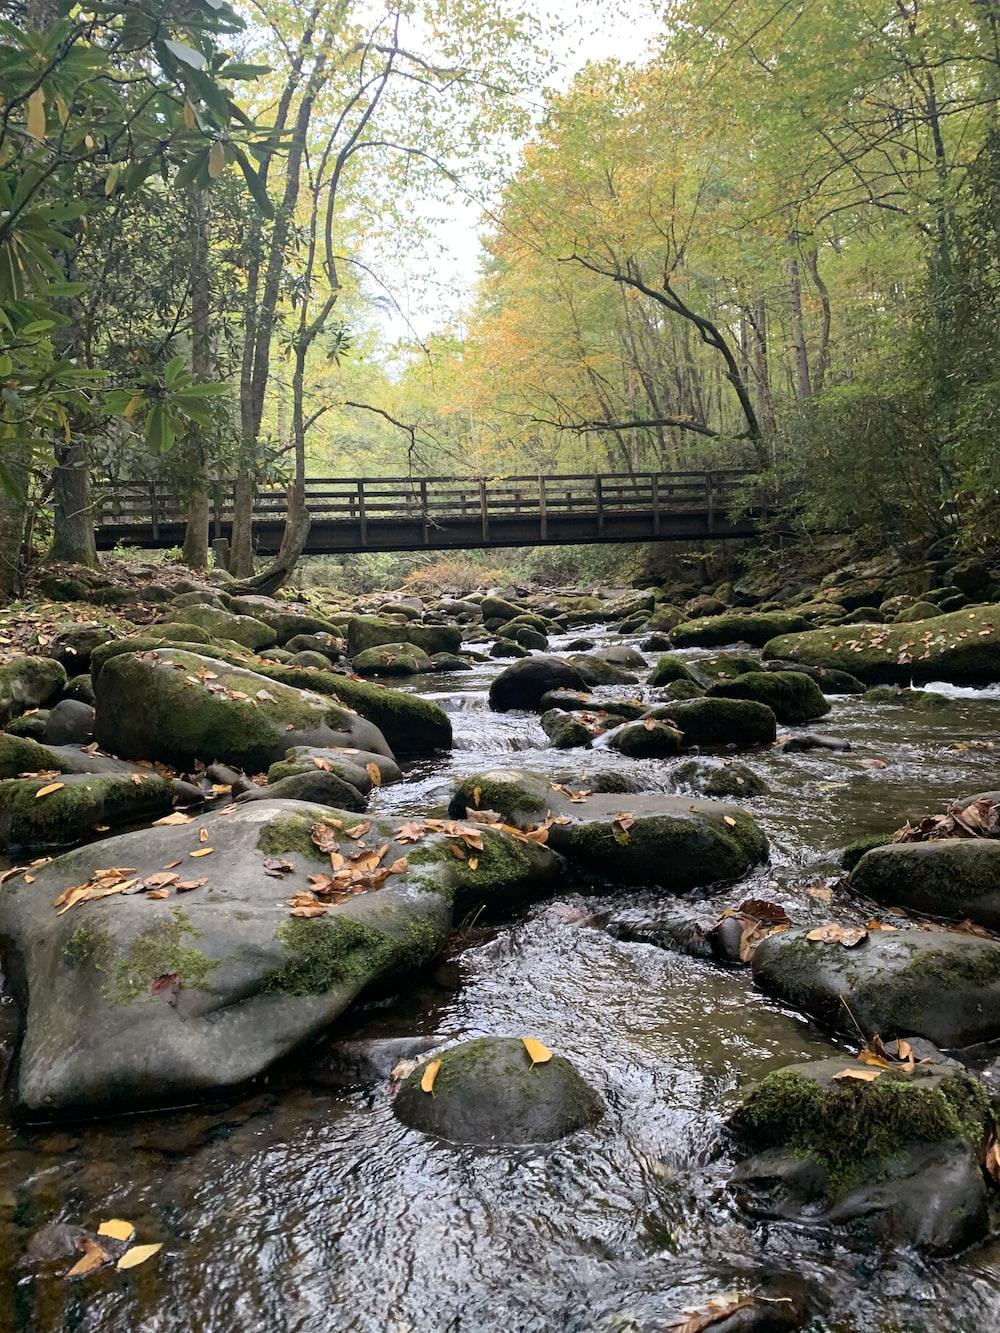 body of water between trees near bridge